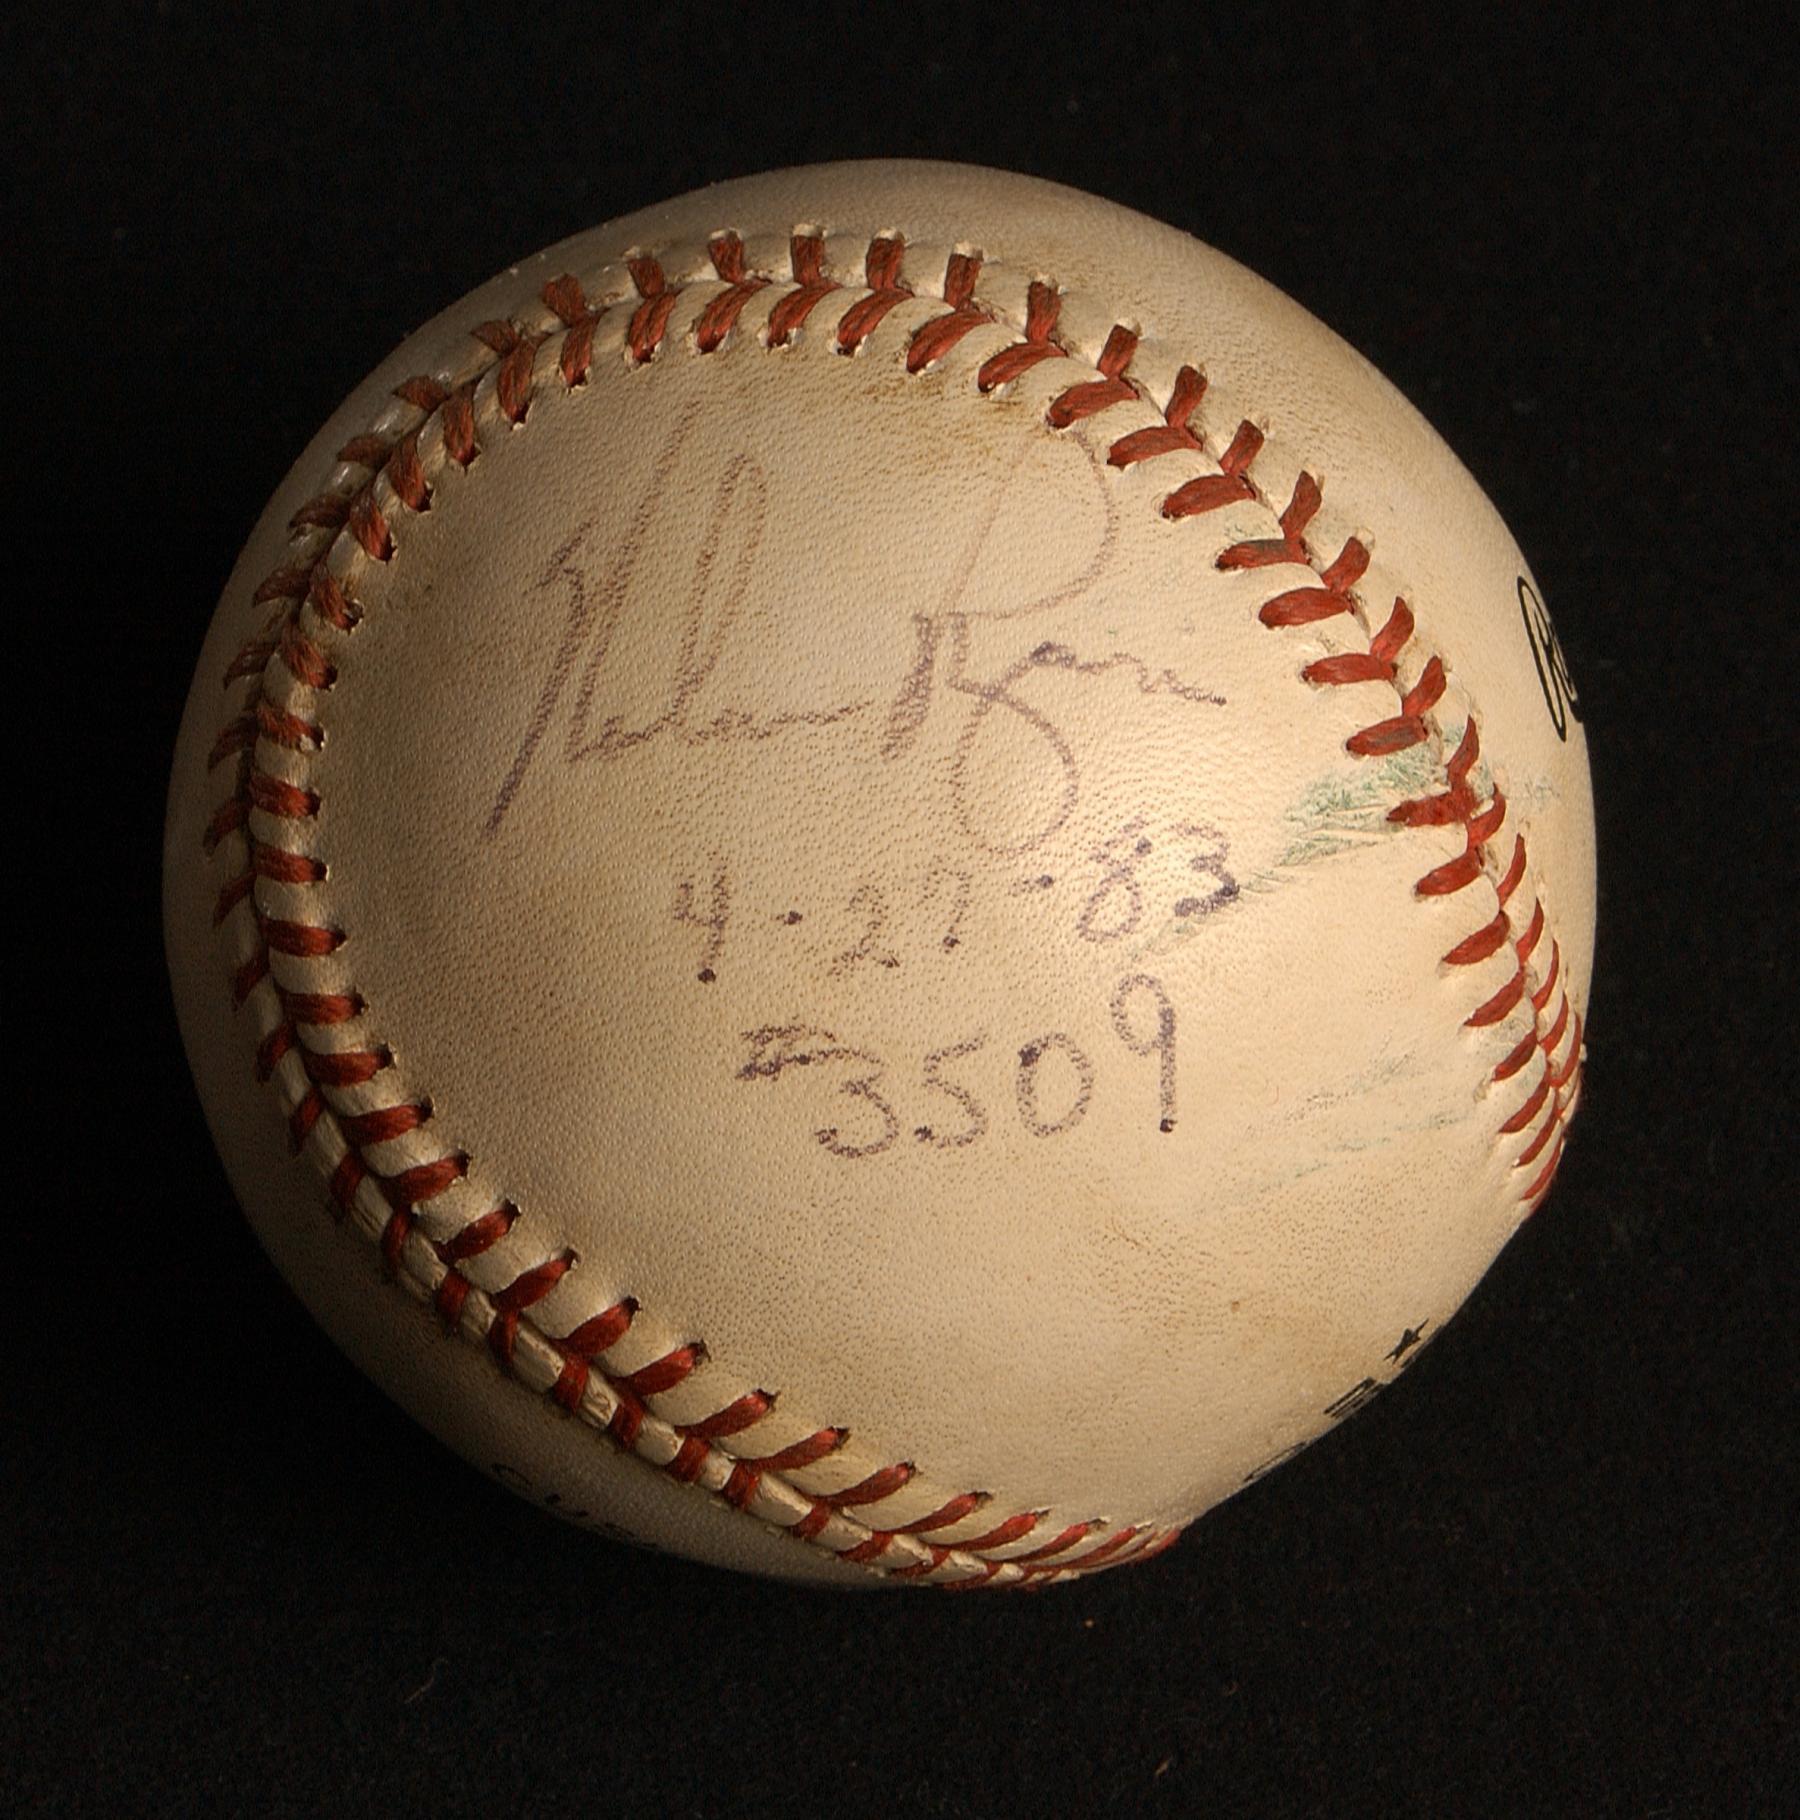 Baseball from Nolan Ryan's 3,509th career strikeout. B-145-83 (Milo Stewart Jr. / National Baseball Hall of Fame)